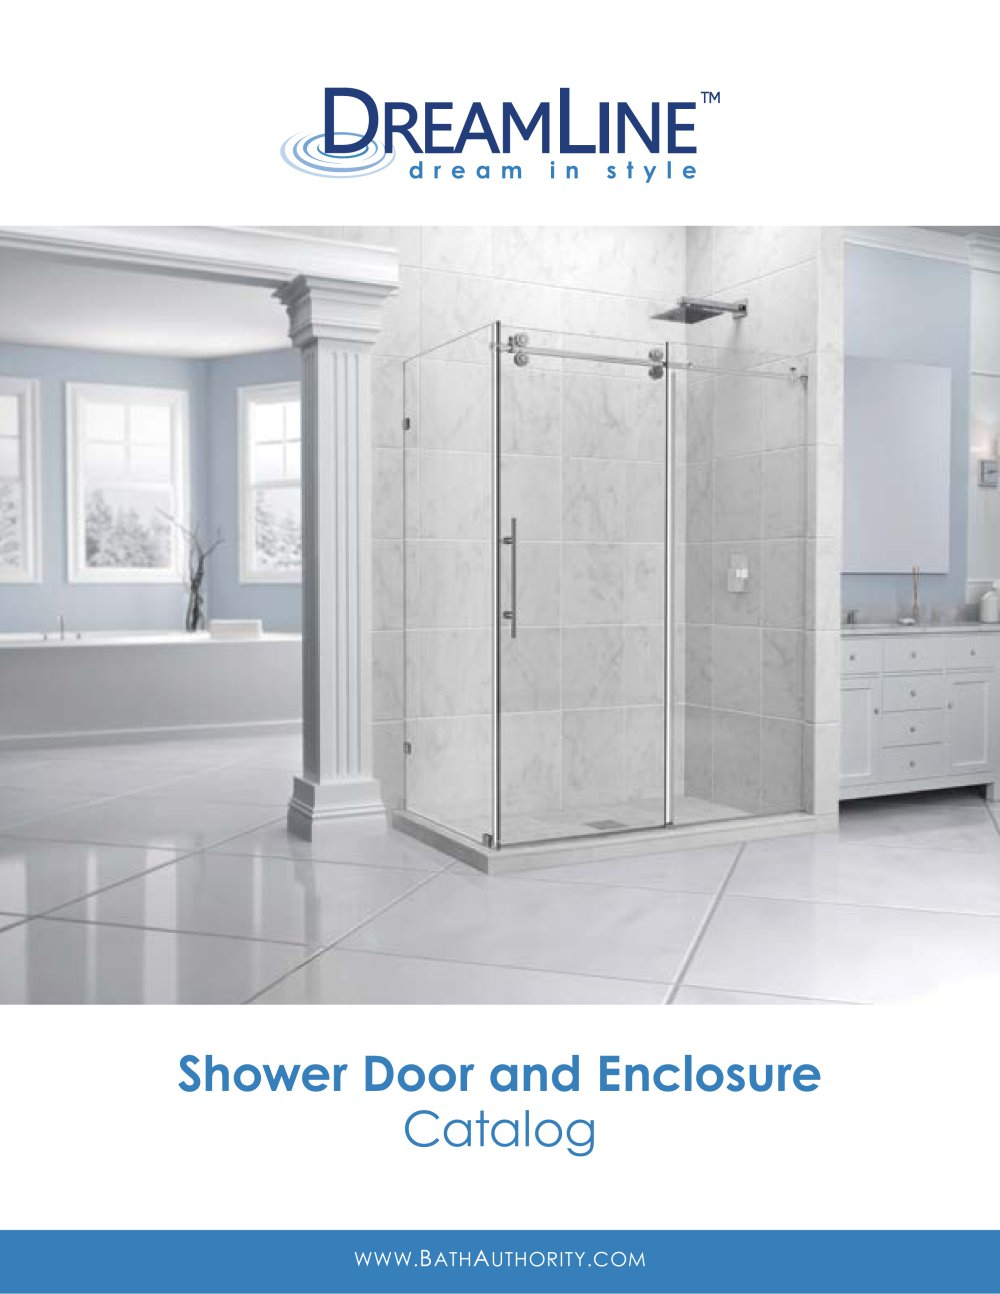 Shower Door and Enclosure Catalog - DreamLine - PDF Catalogues ...